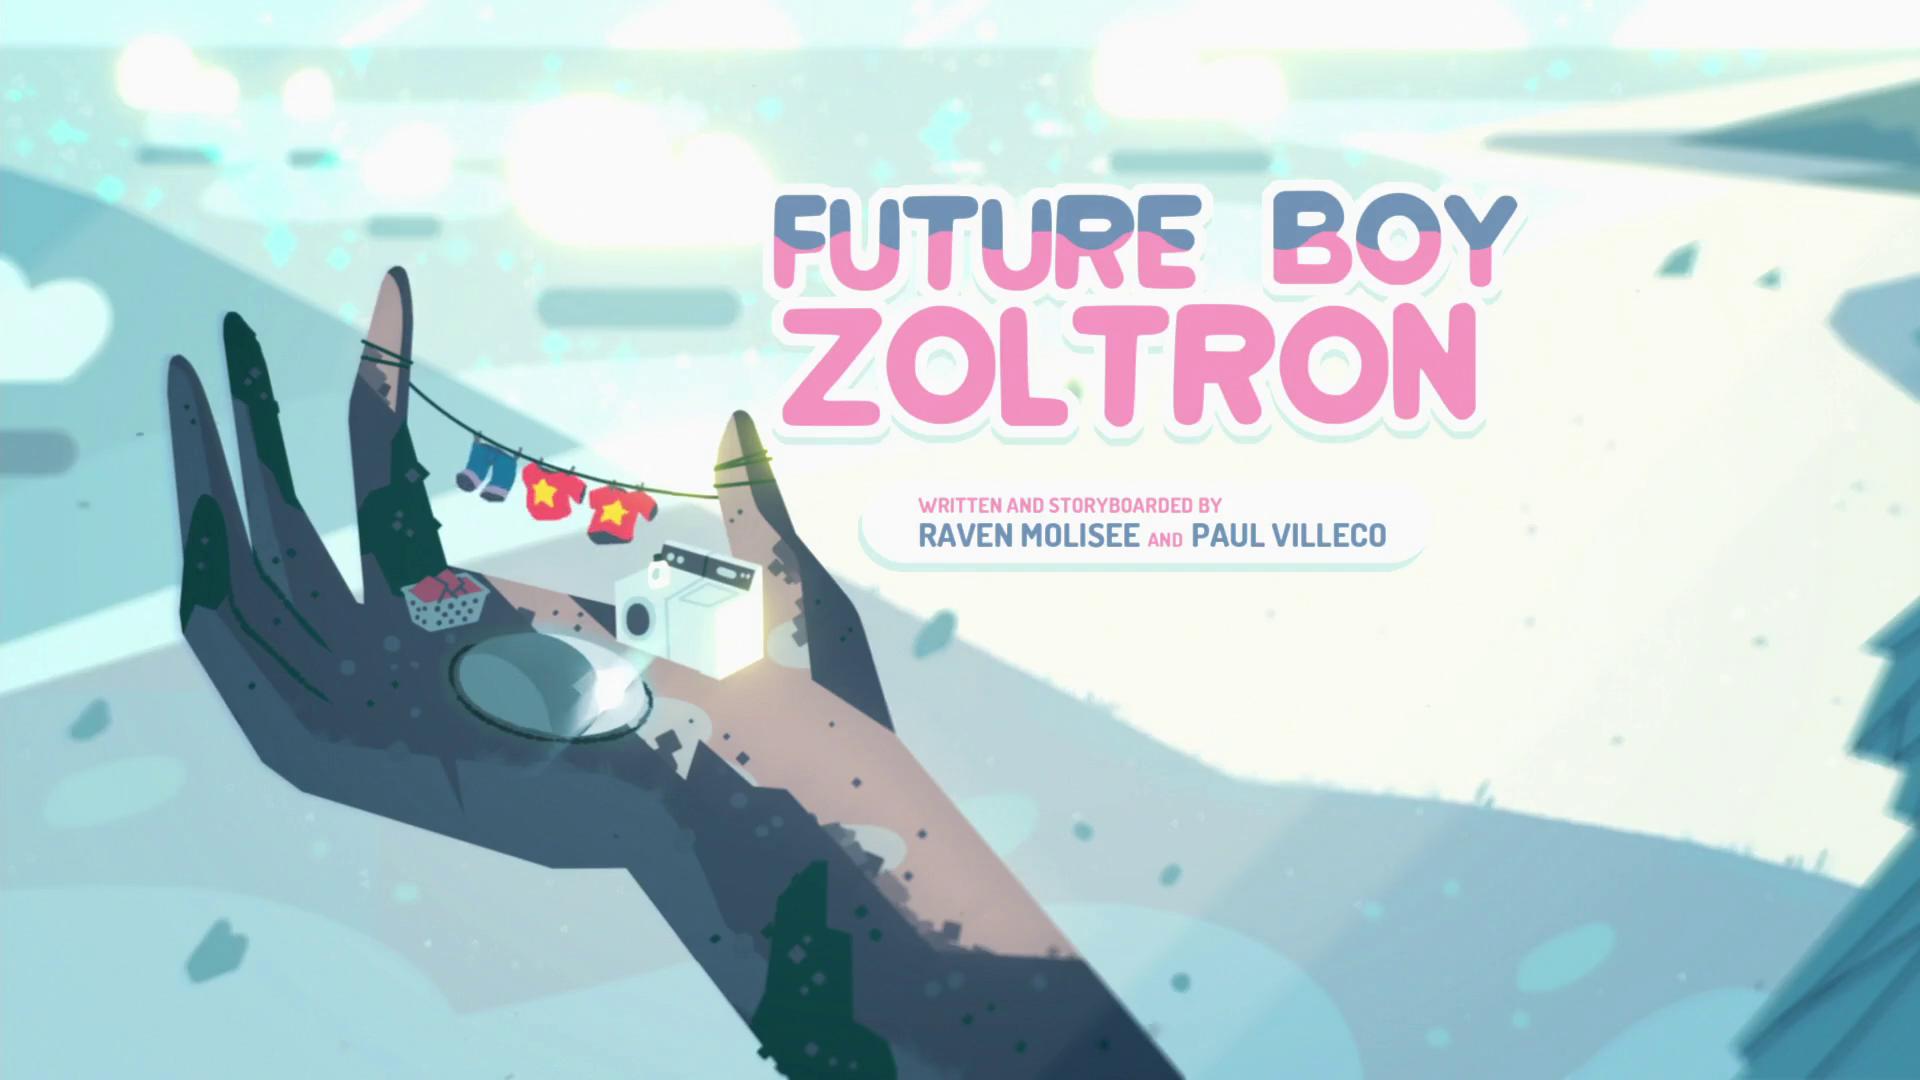 Future Boy Zoltron/Gallery